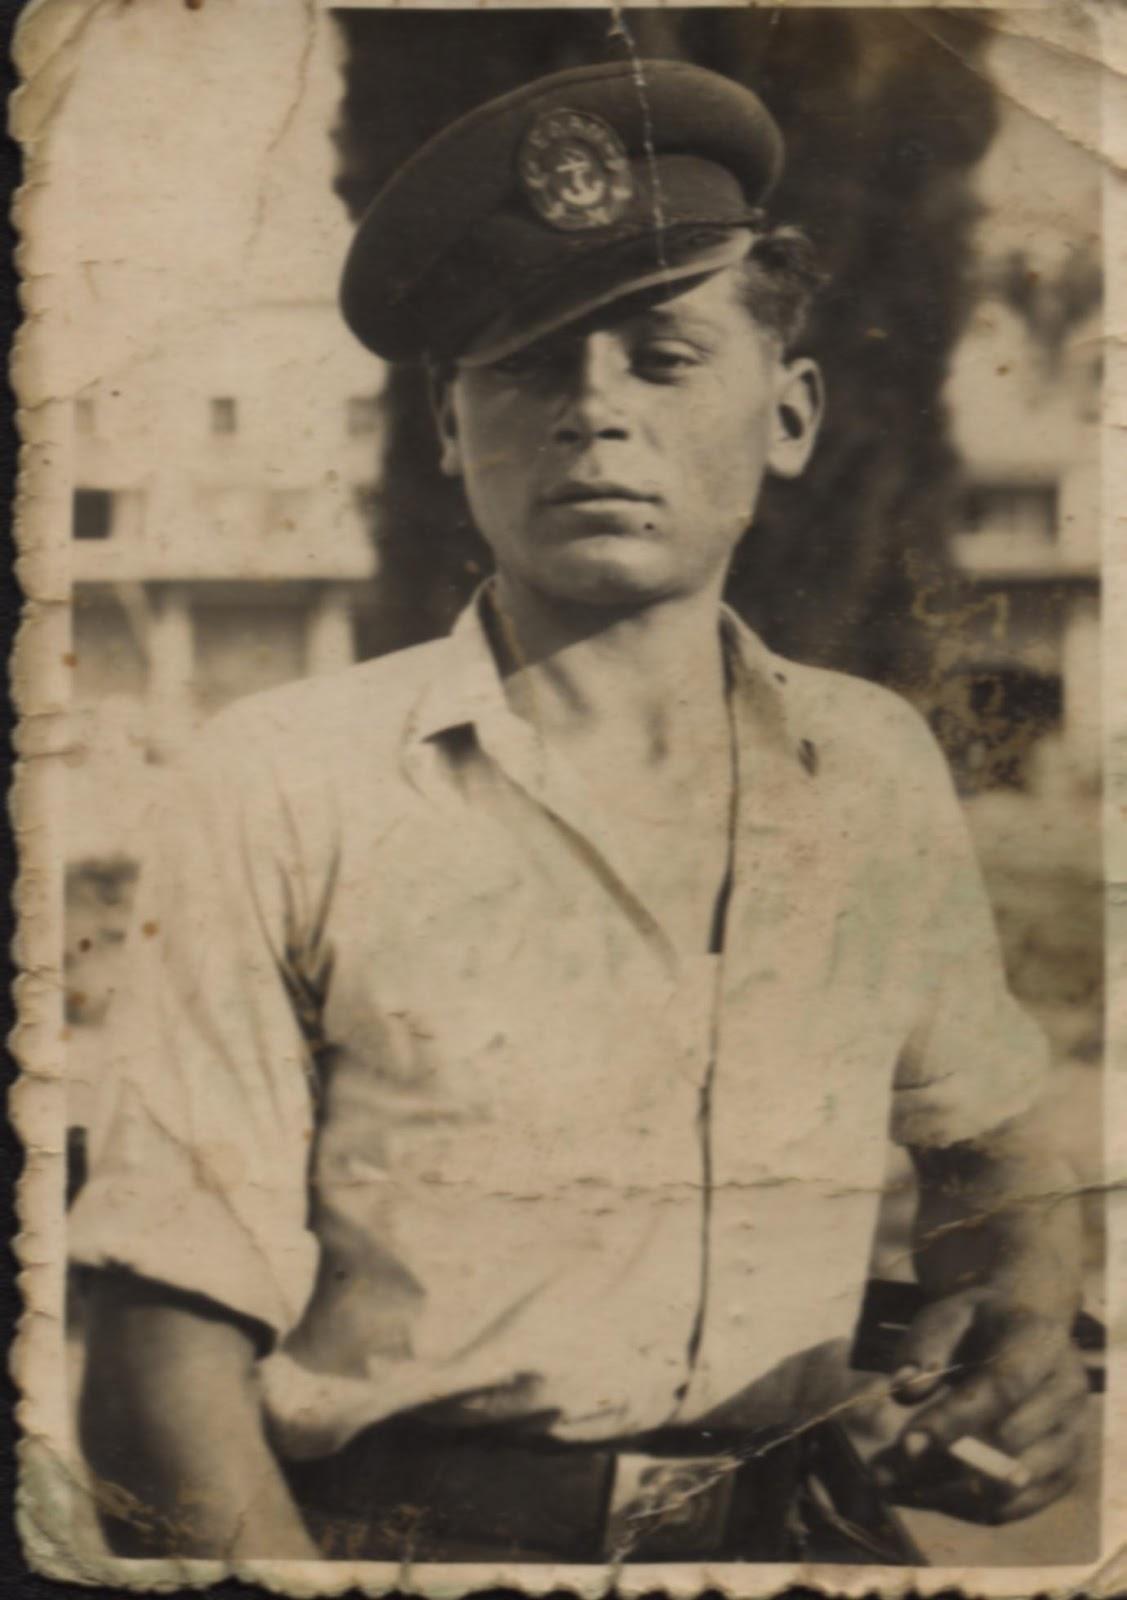 Lexar:ΕΛΑΝ ΜΙΚΡΕΣ ΦΩΤ:Ματζώνας, ΕΛΑΝ:1944_Ε.Λ.Α.Ν._ΧΑΜΑΪΔΟΣ.Ν..jpg